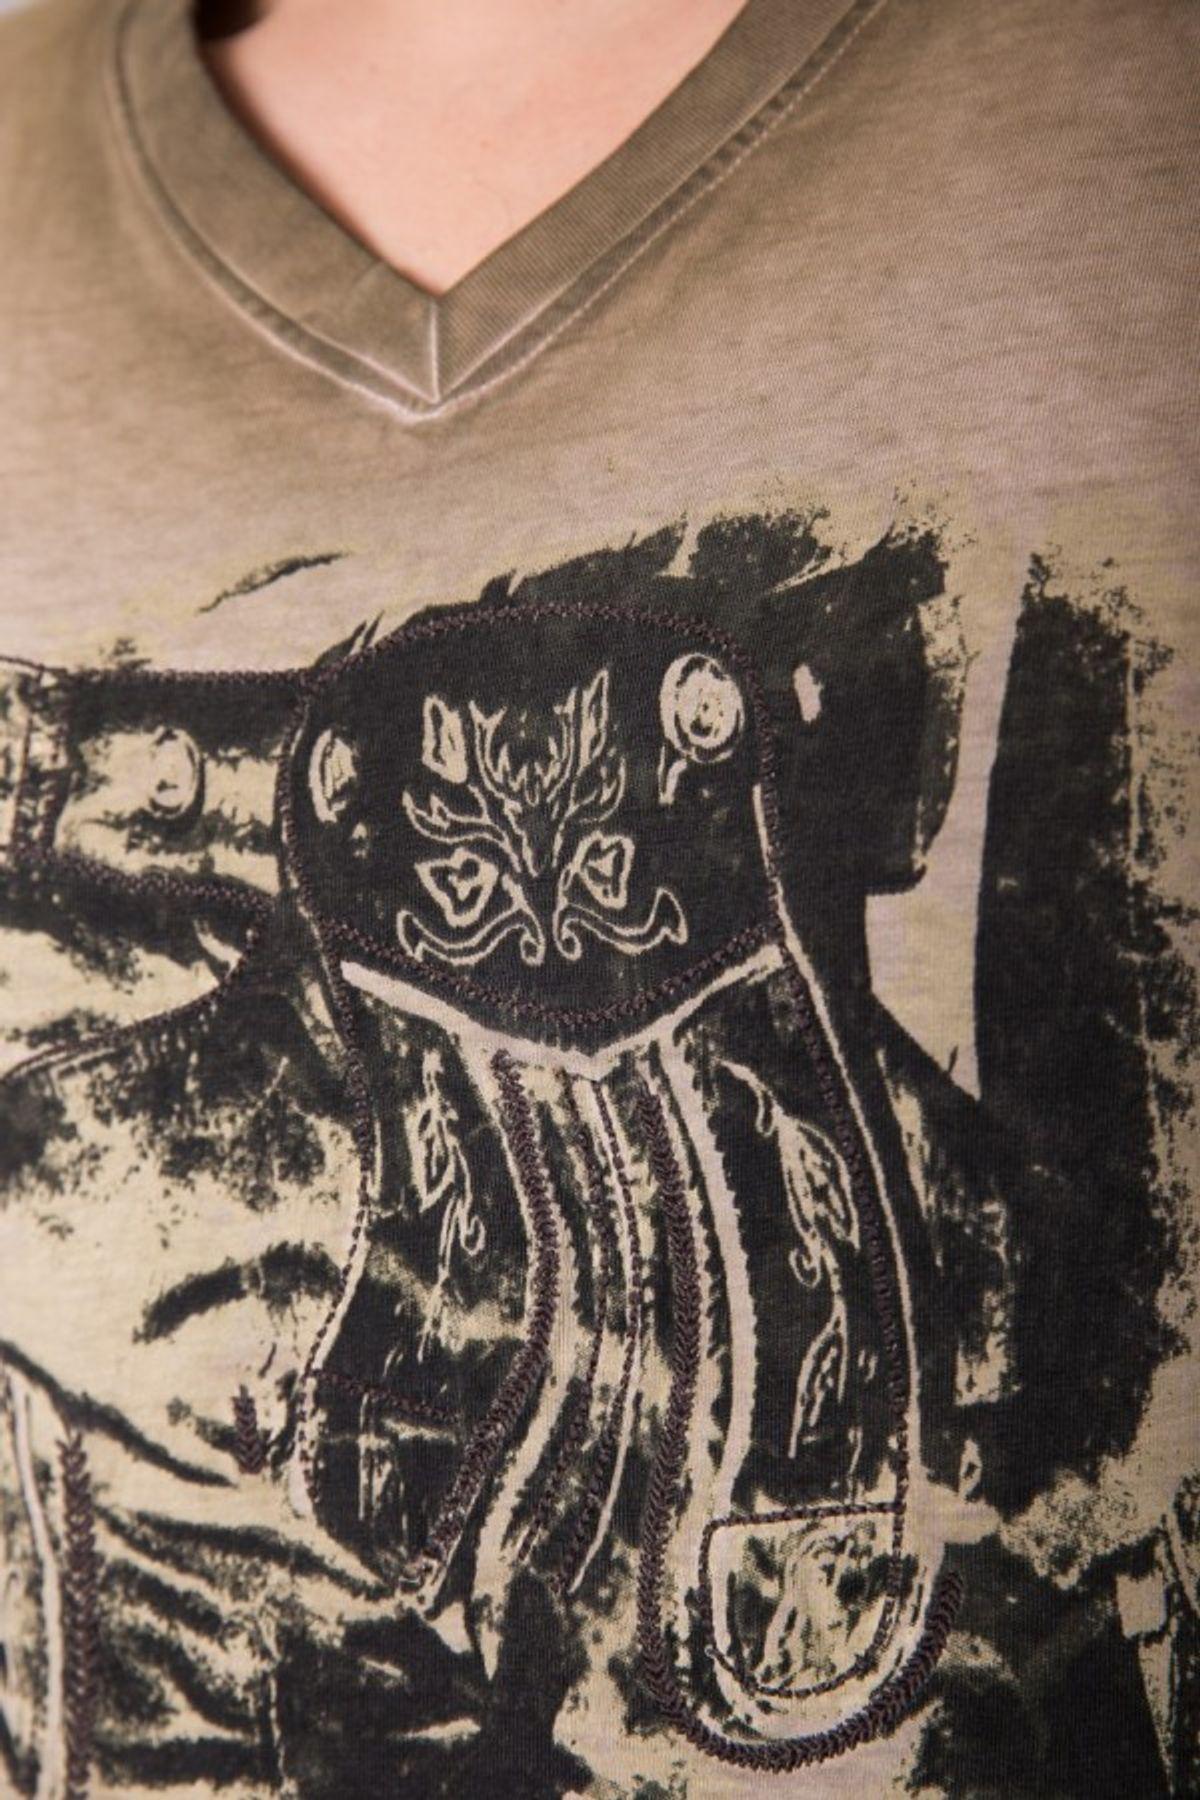 Krüger - Herren Trachten T-Shirt in braun, Seppelhose (91280-7) – Bild 4